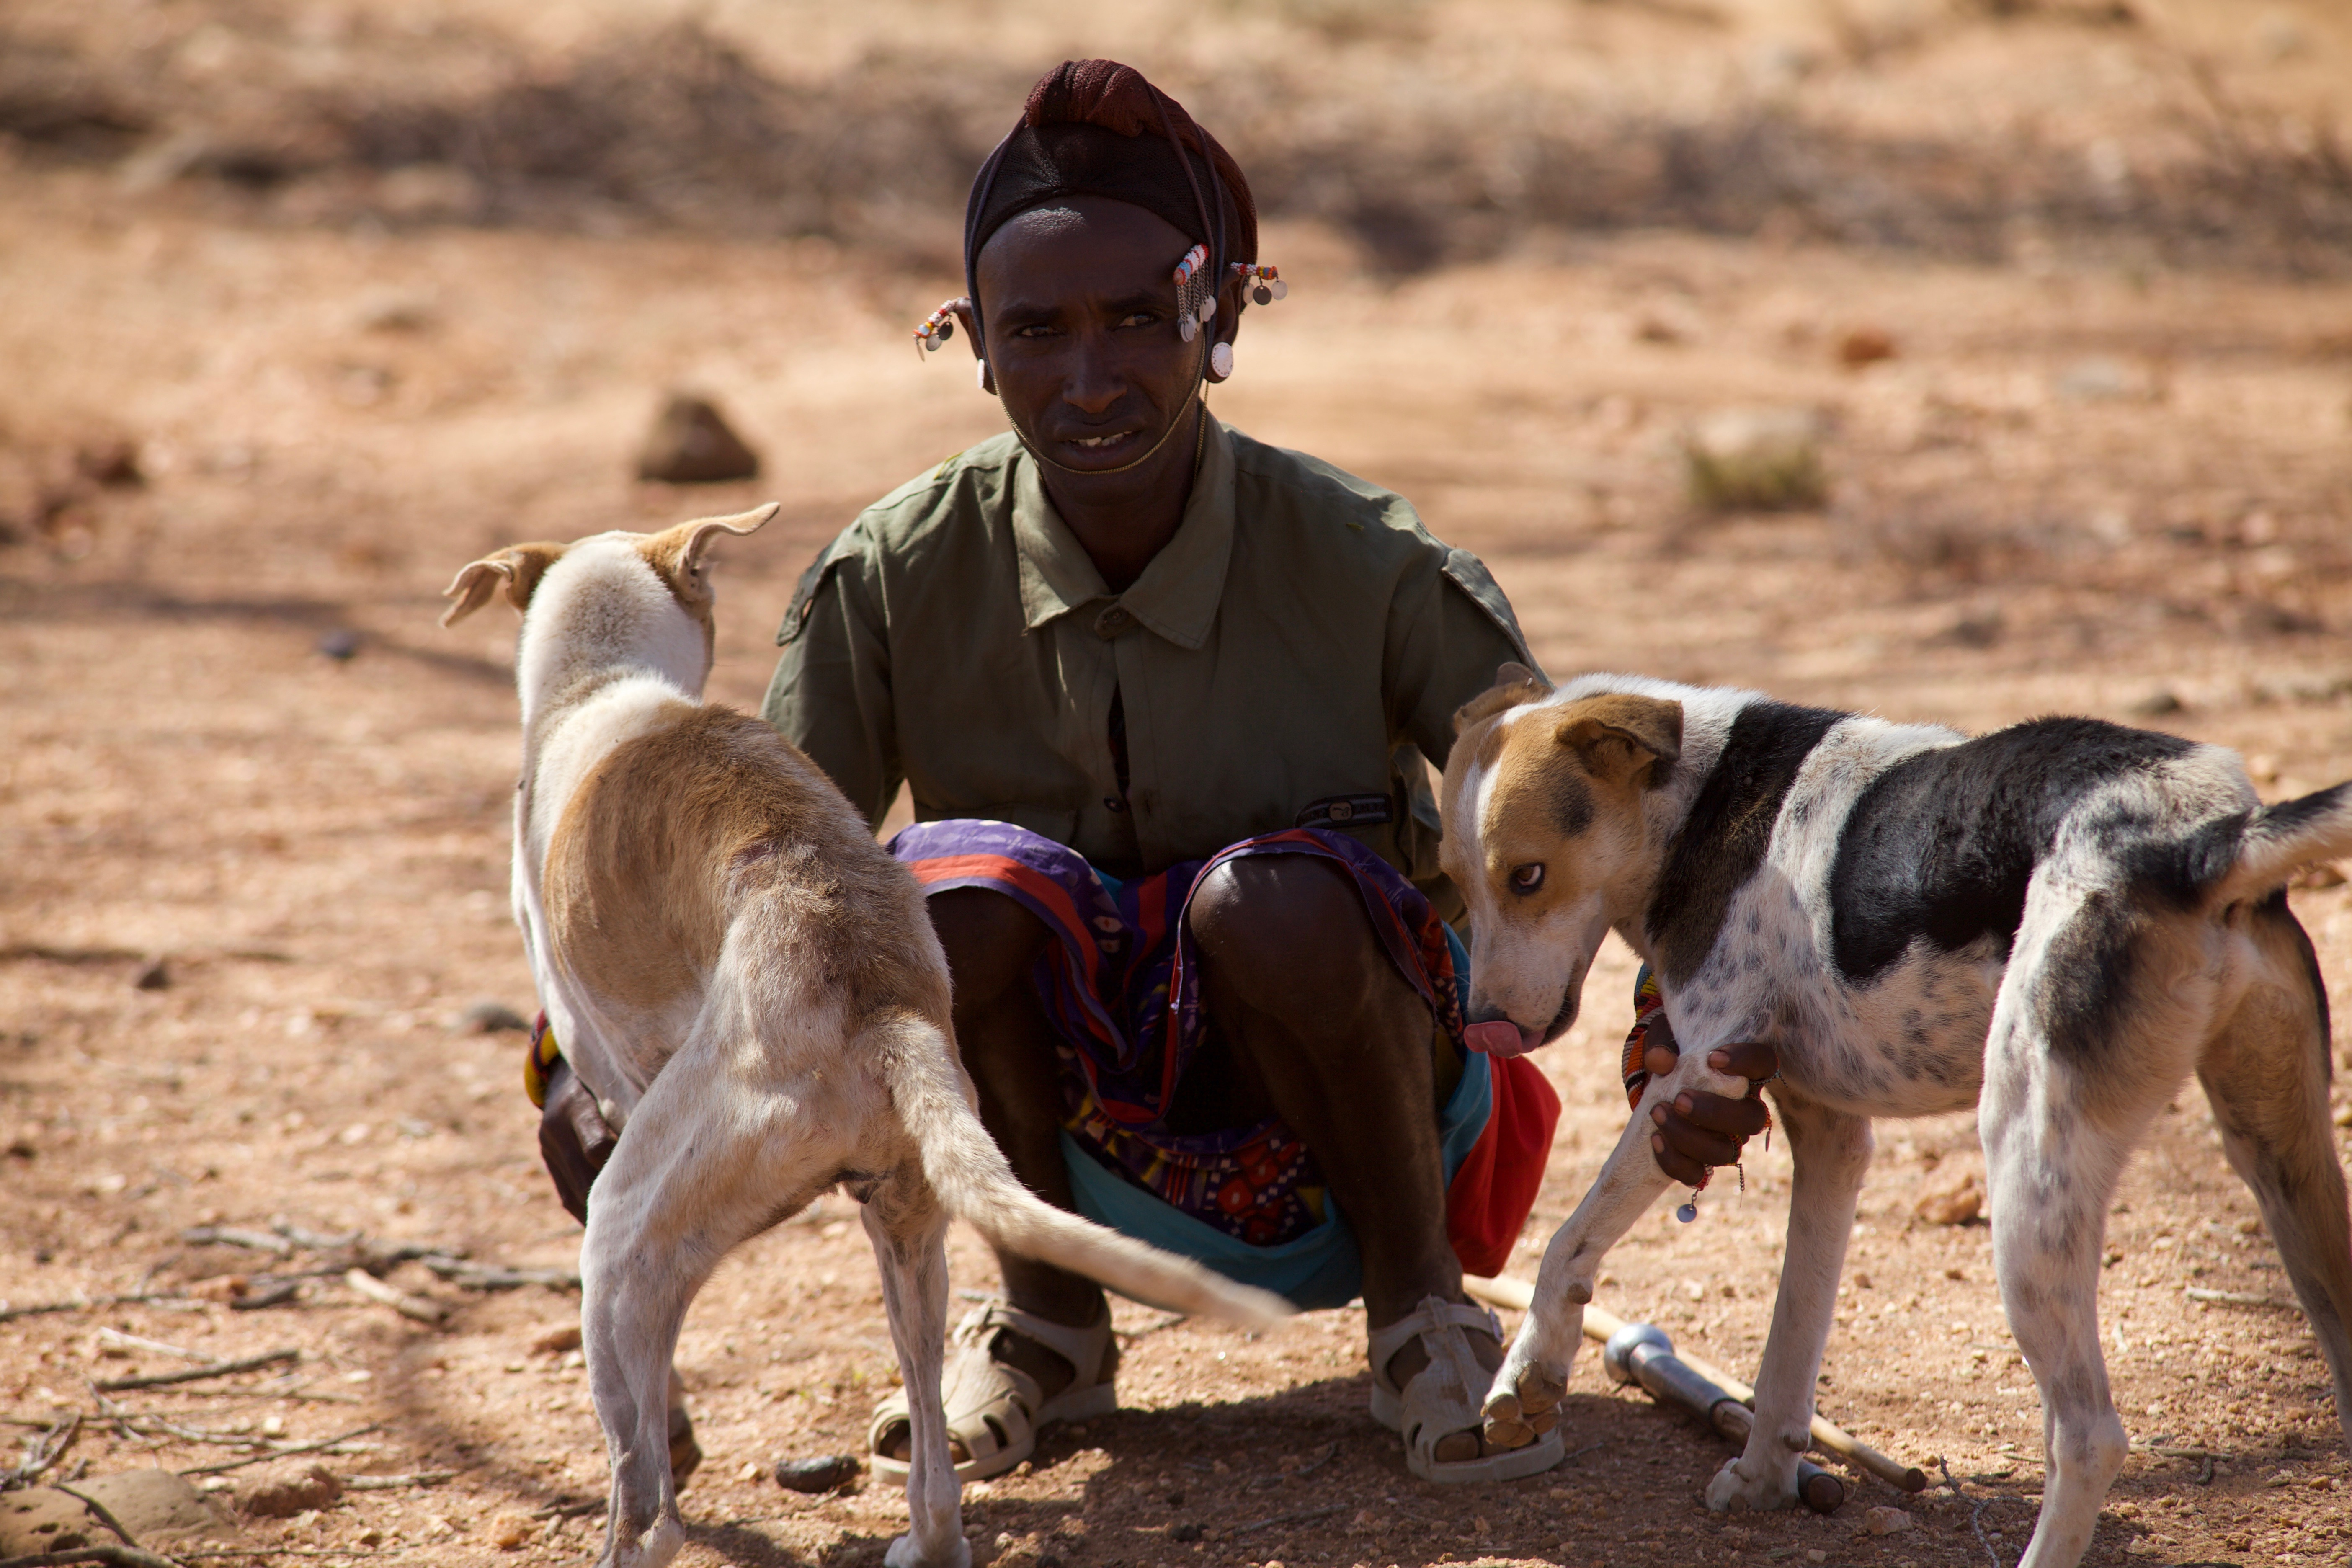 A warrior with his very faithful hounds